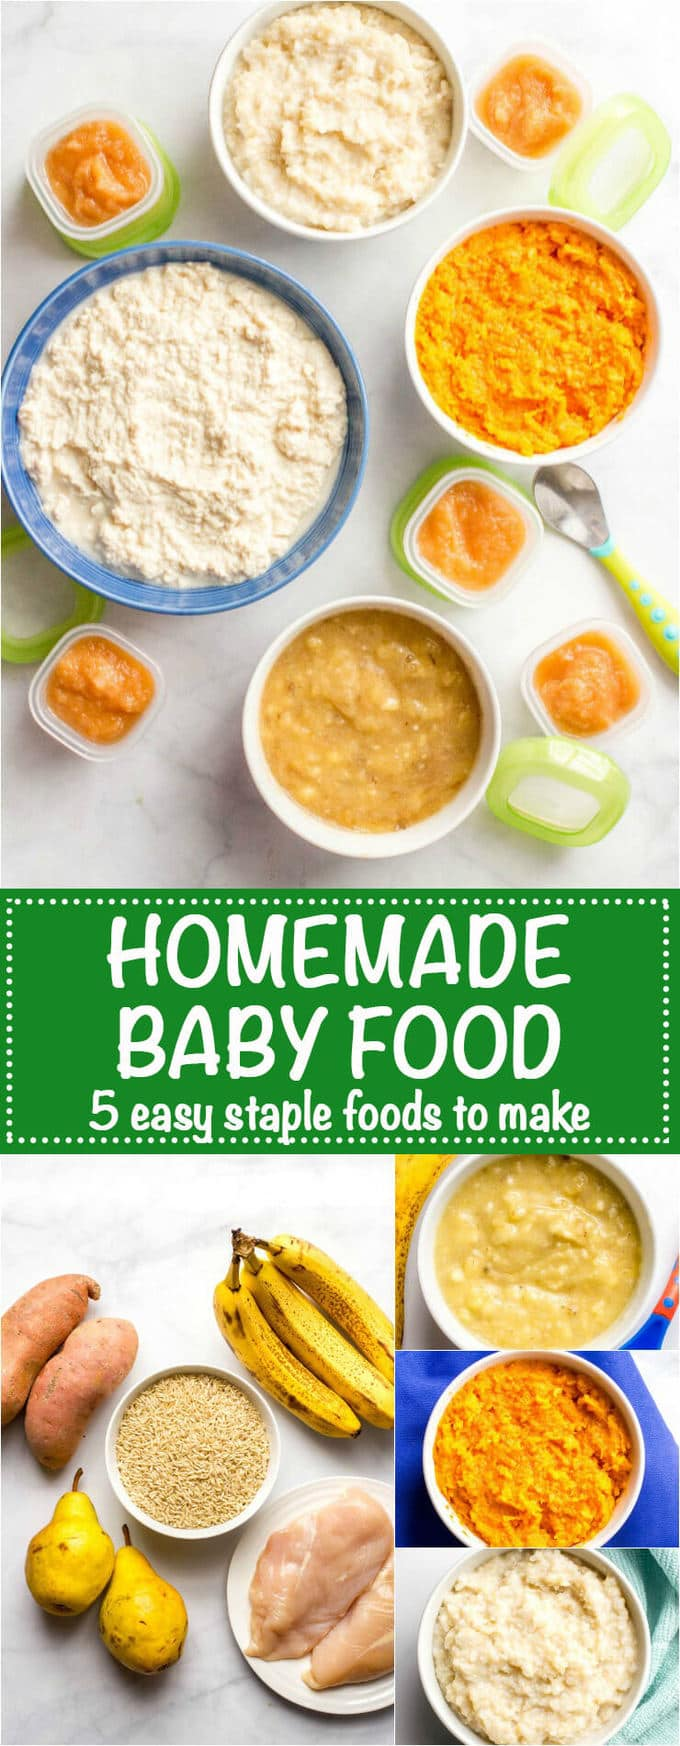 Homemade baby food: Sweet potatoes, brown rice, chicken ...